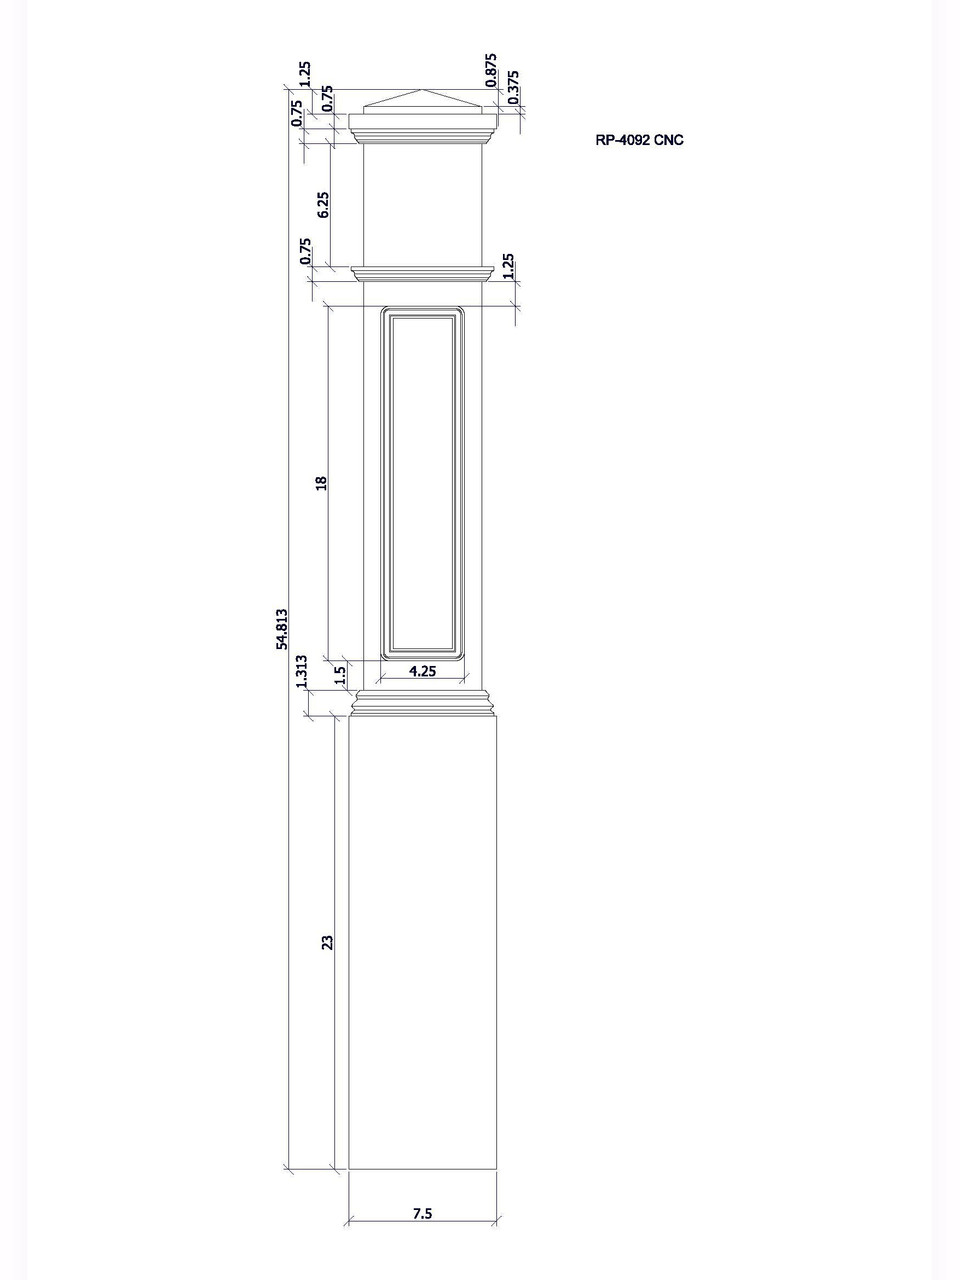 RP-4092 CNC Raised Panel Box Newel Post, CADD Image